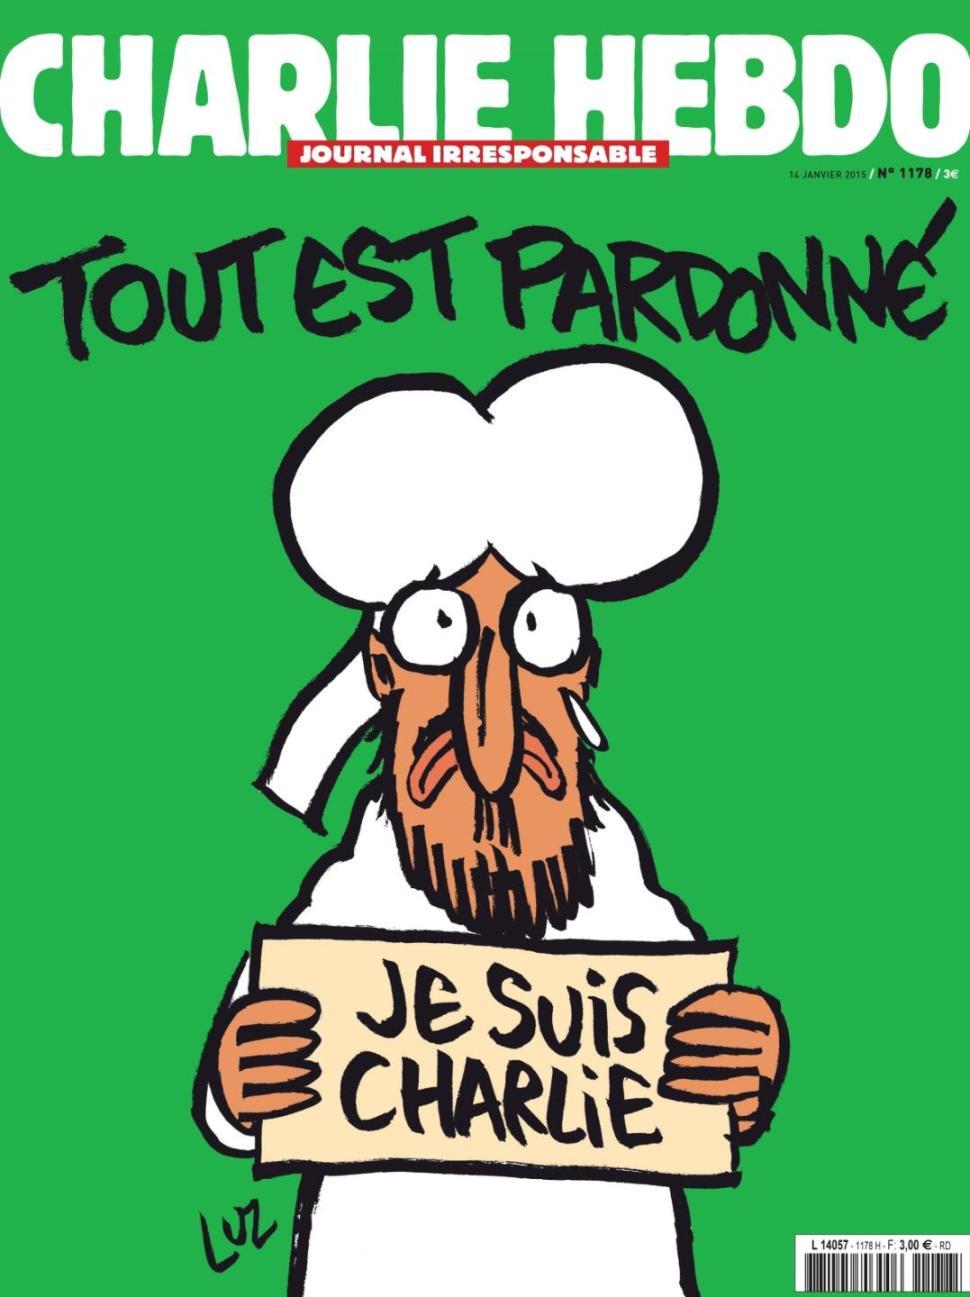 The Finansial Times: Россия и Турция предпочли теории заговора в деле Charlie Hebdo